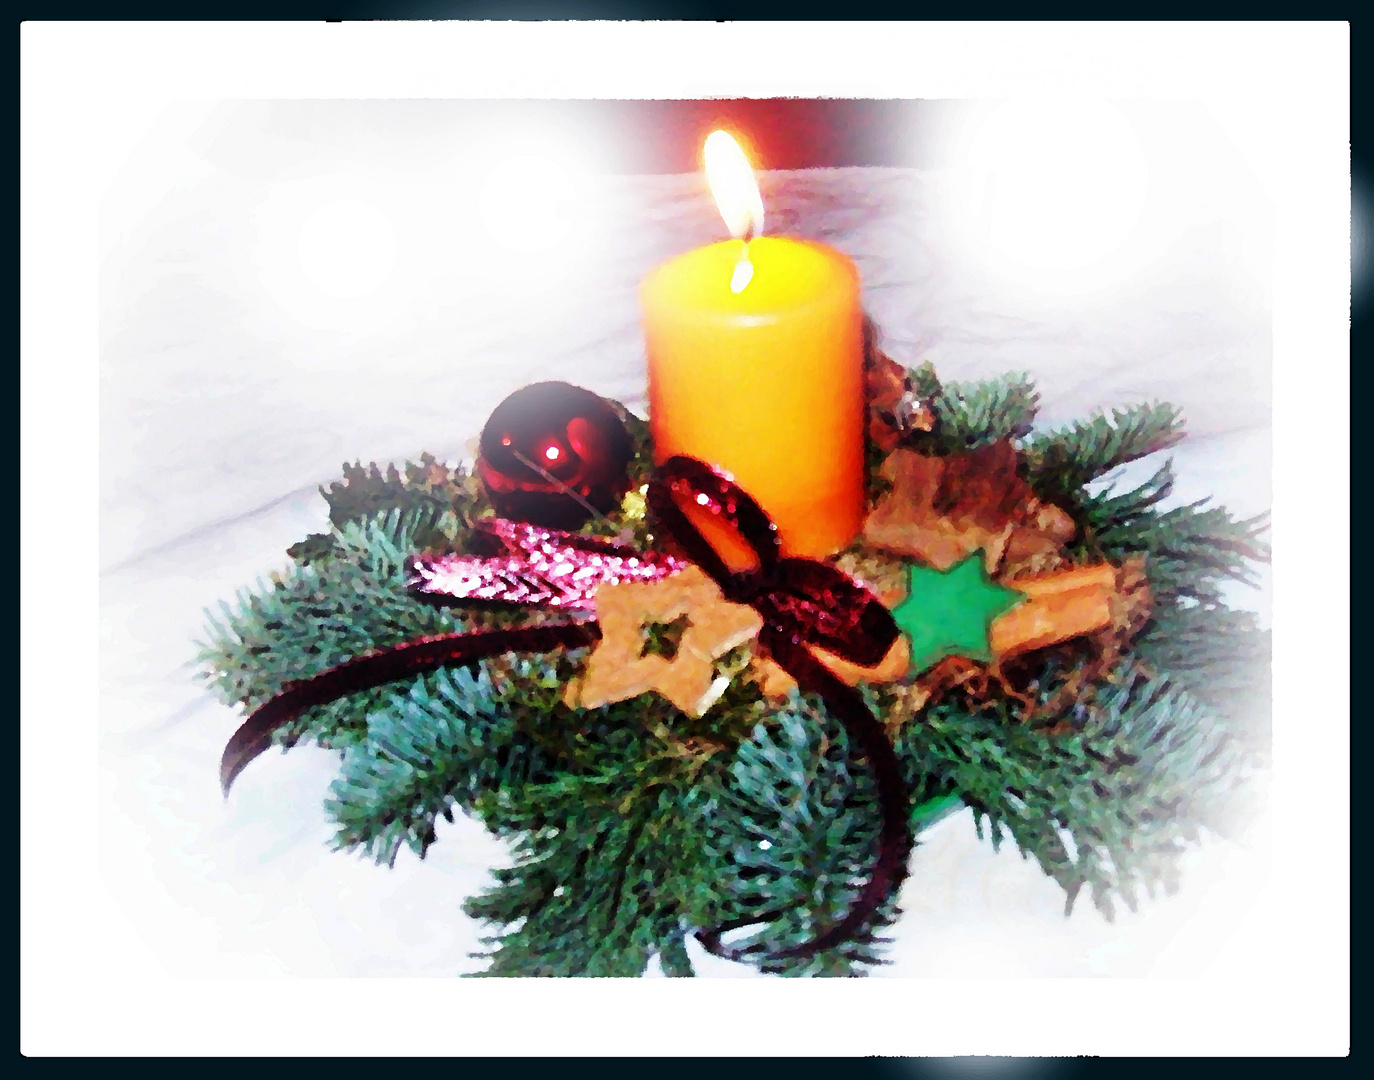 °°° Merry Christmas °°°